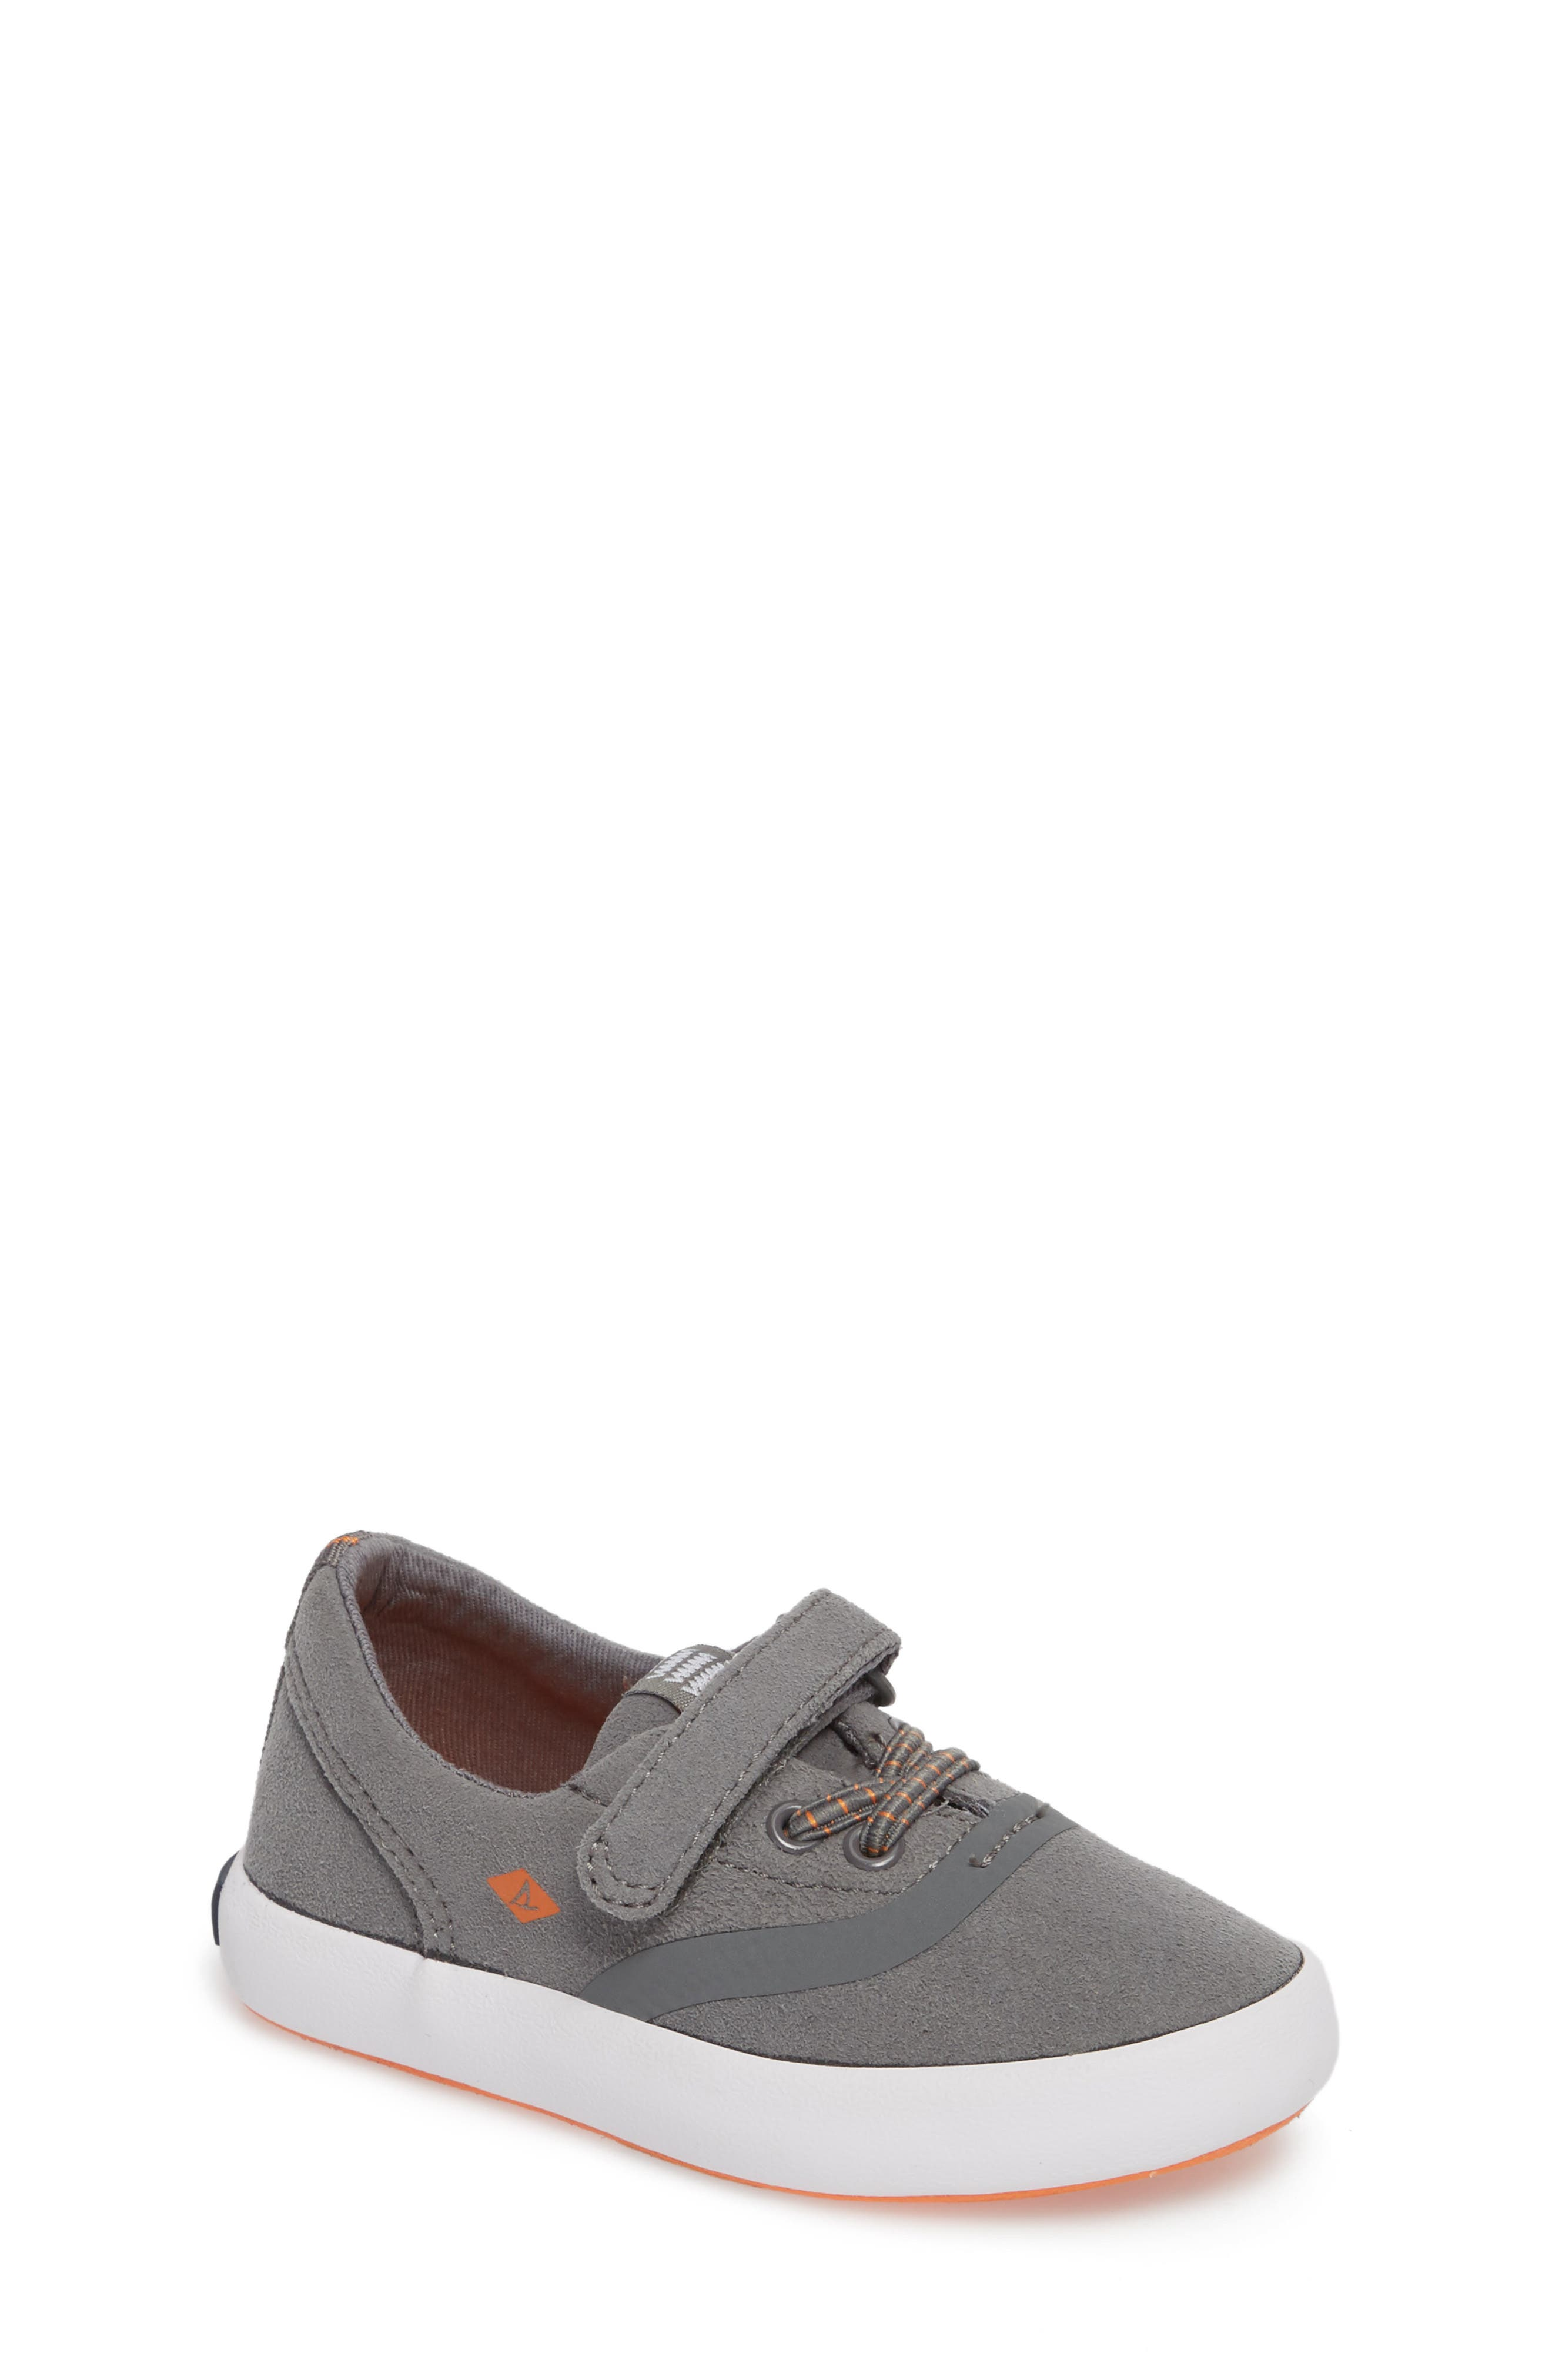 Wahoo Junior Sneaker,                         Main,                         color, 020